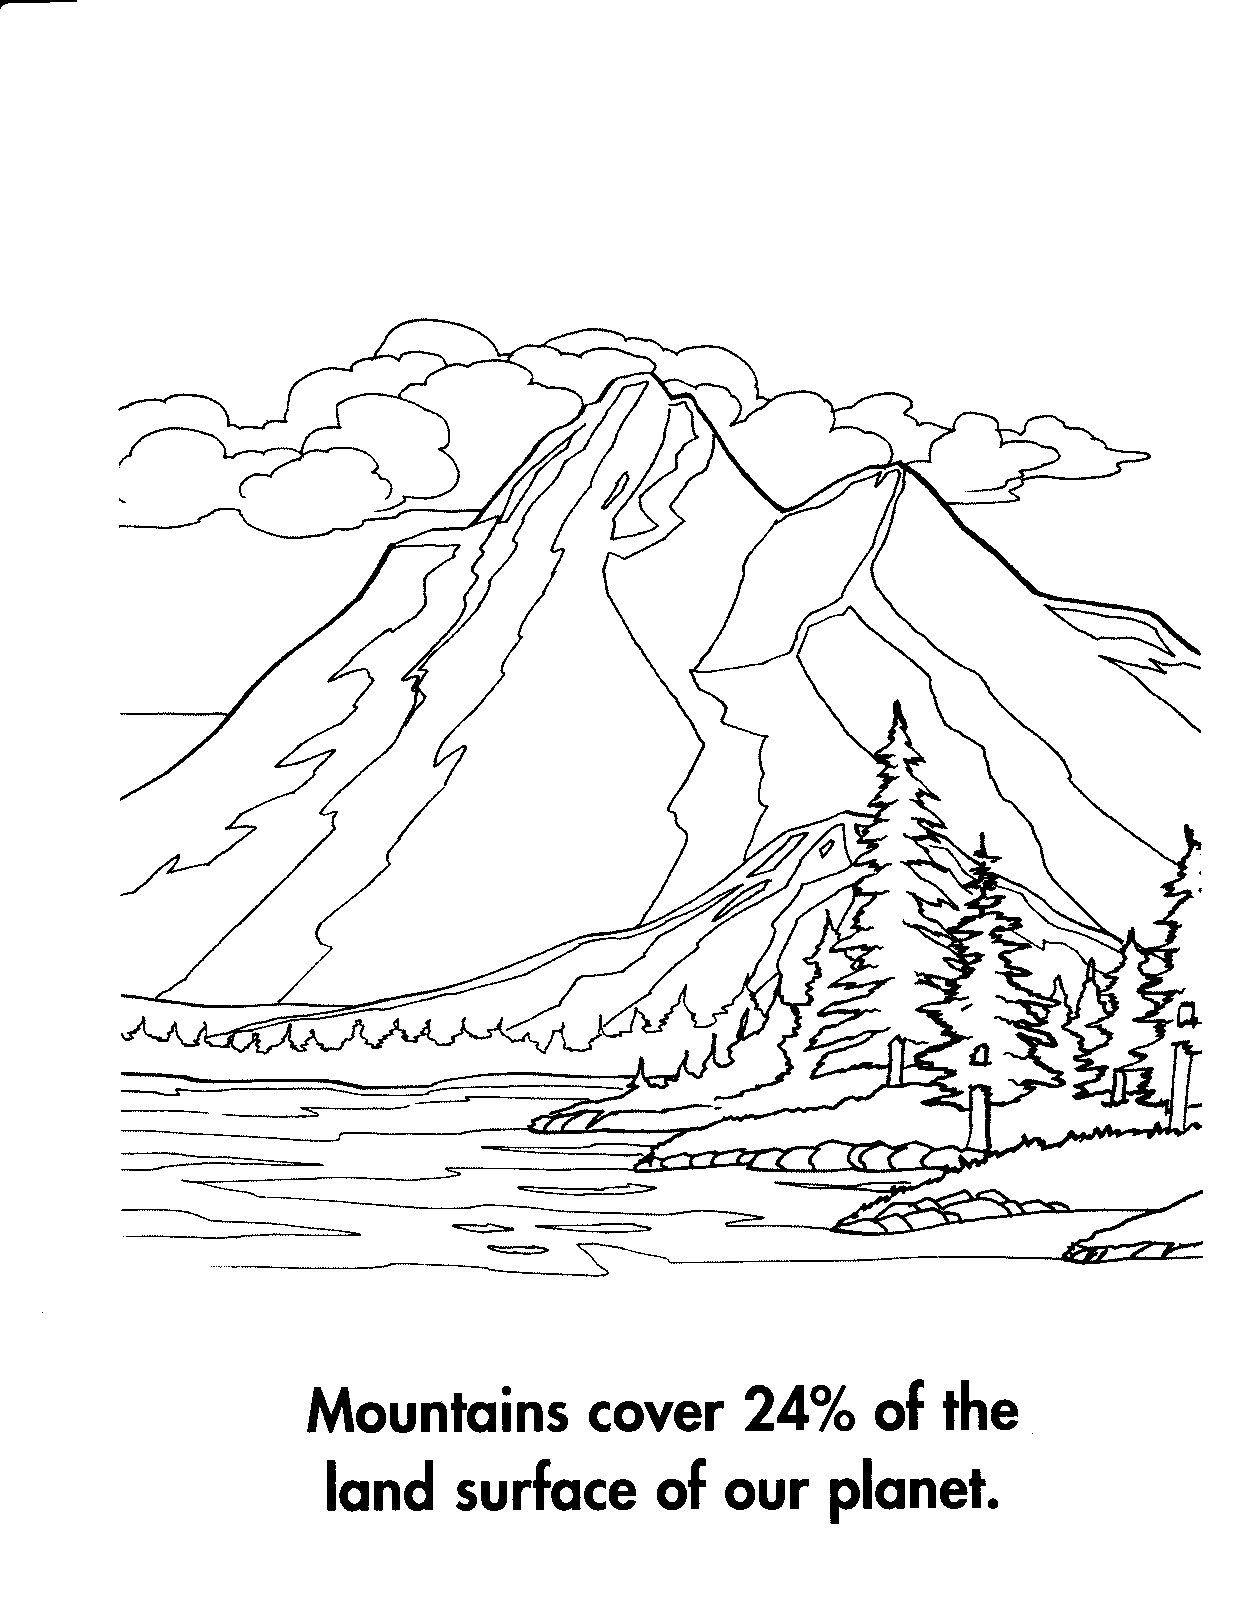 Landform Worksheets For 2nd Grade In 2020 Coloring Pages Winter Coloring Pages Nature Summer Coloring Pages